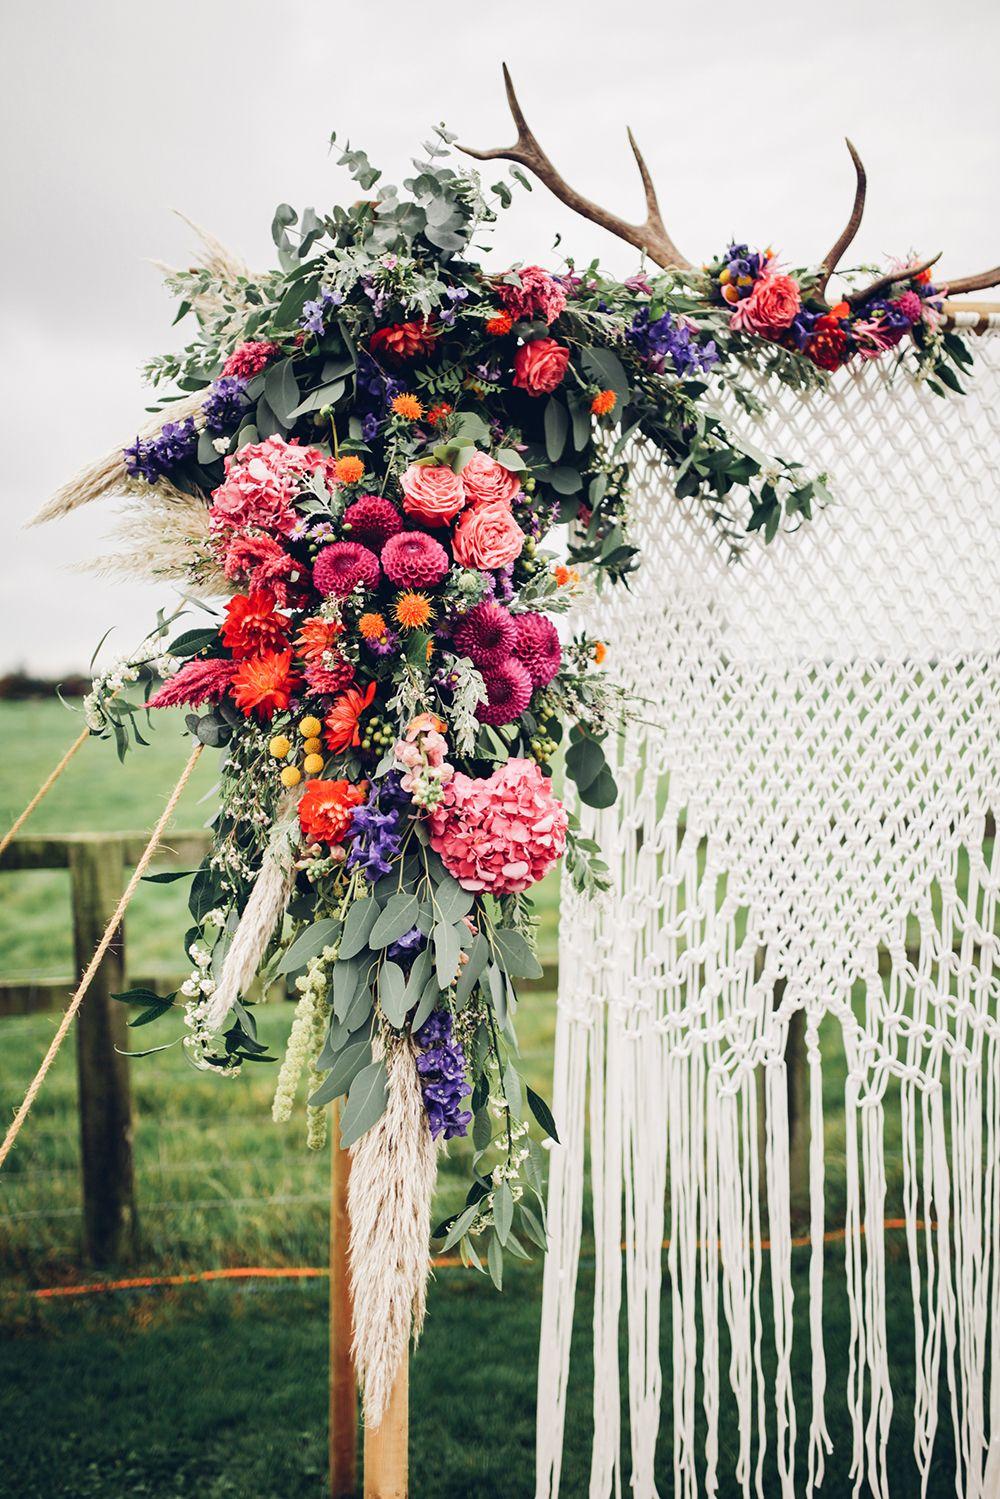 Matrimonio Gipsy Chic : Idee per nozze bohemien matrimonio boho chic diy wedding